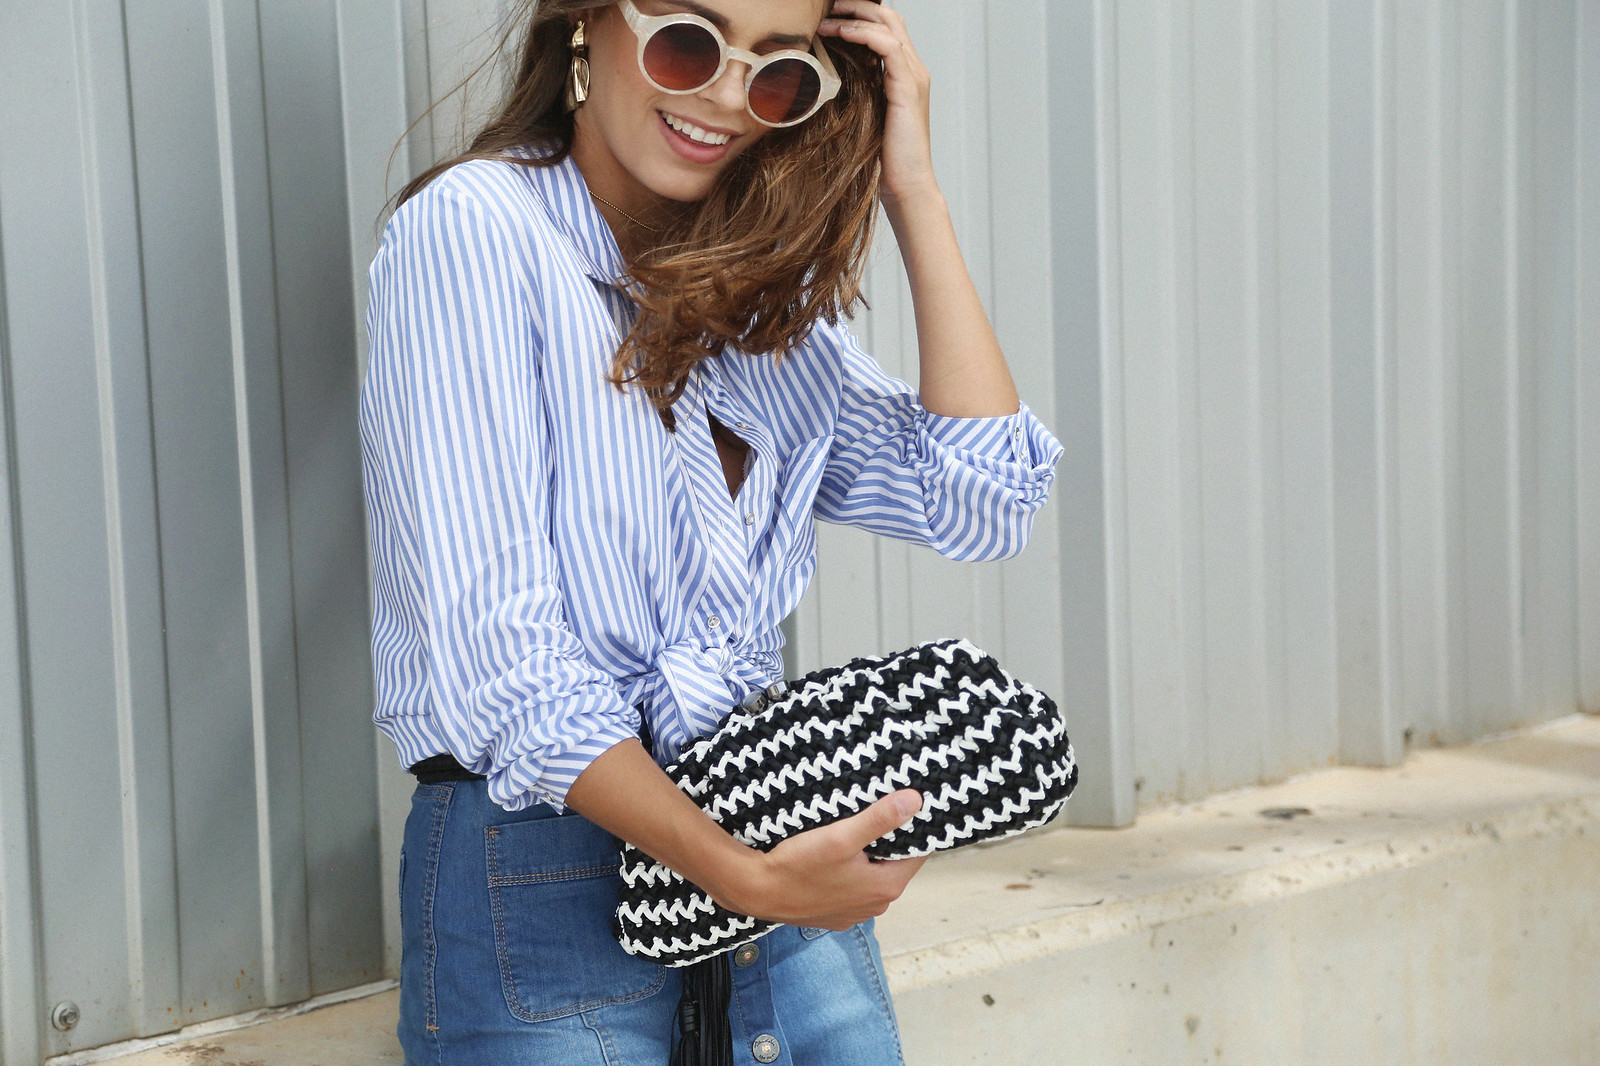 jessie chanes seams for a desire denim skirt stripes shirt-2